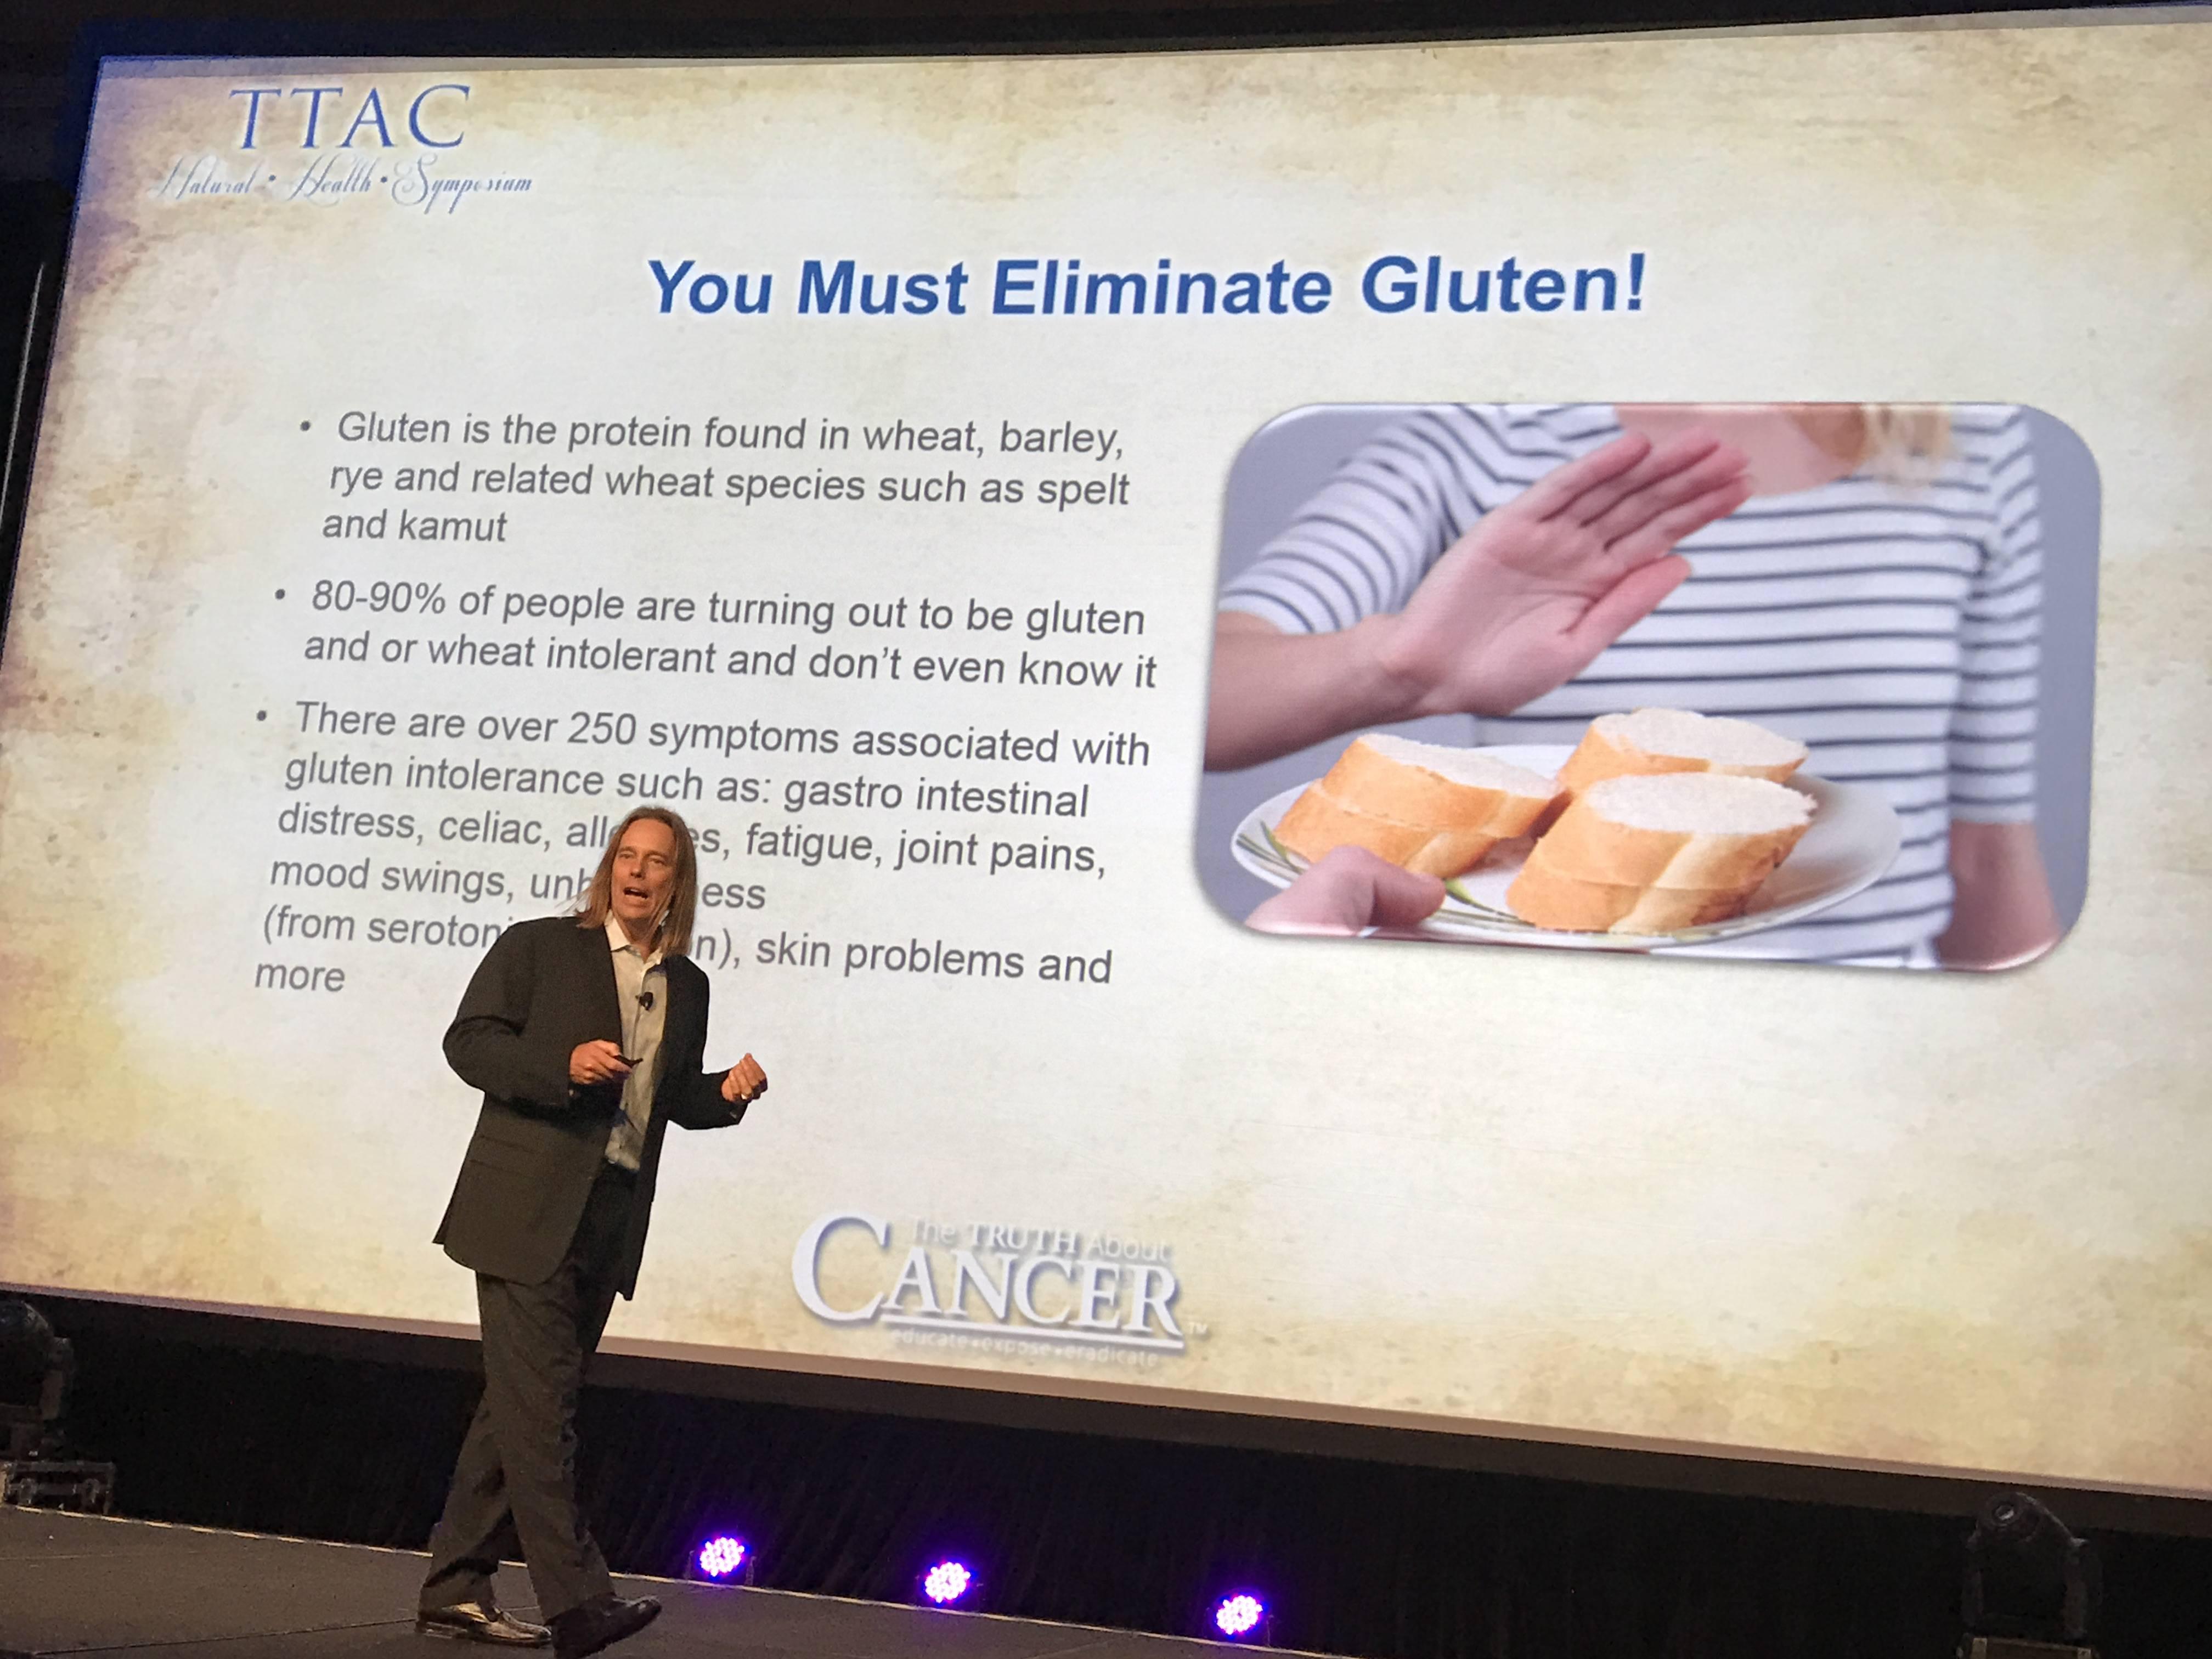 Dr. Group disusses gluten sensitivity.